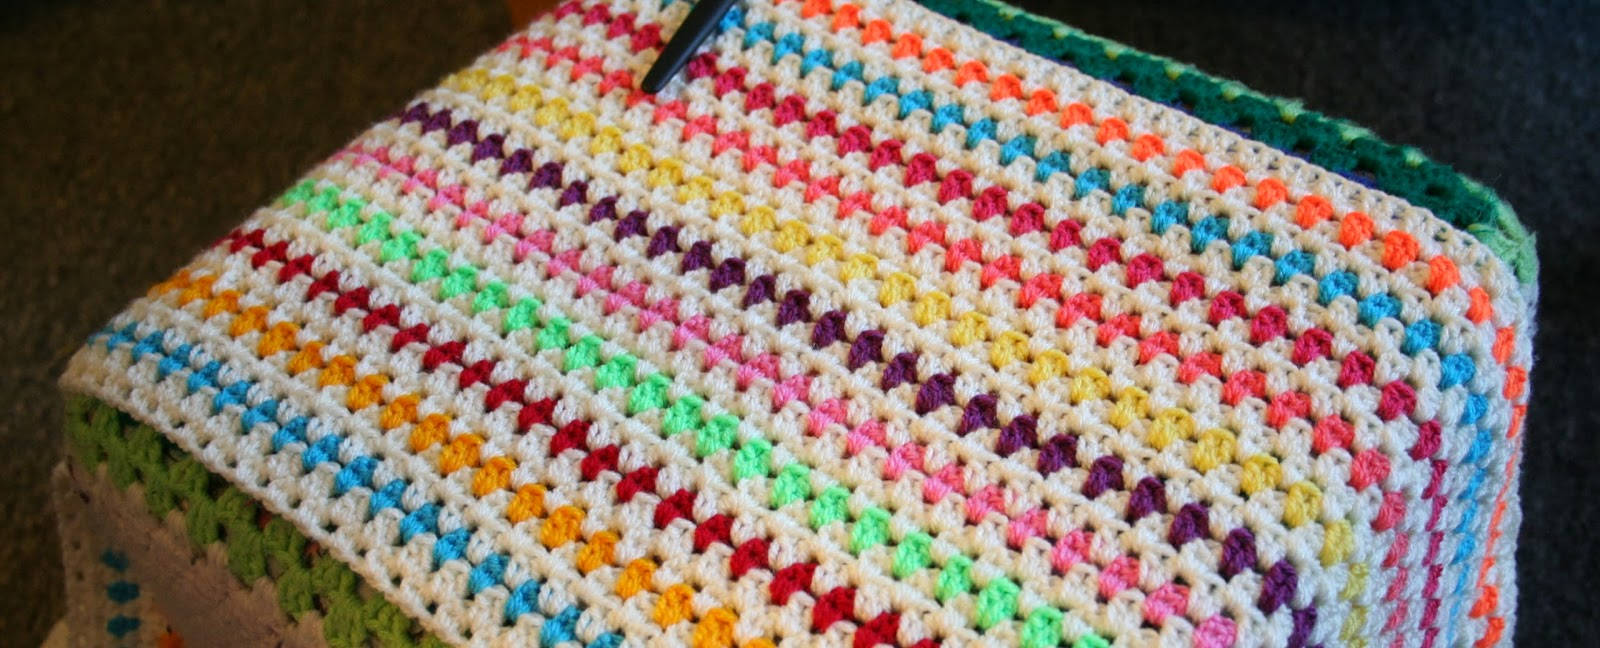 Crochet Baby Blanket Diamond Pattern : Diamond Stitch Crochet Pattern - Hot Girls Wallpaper